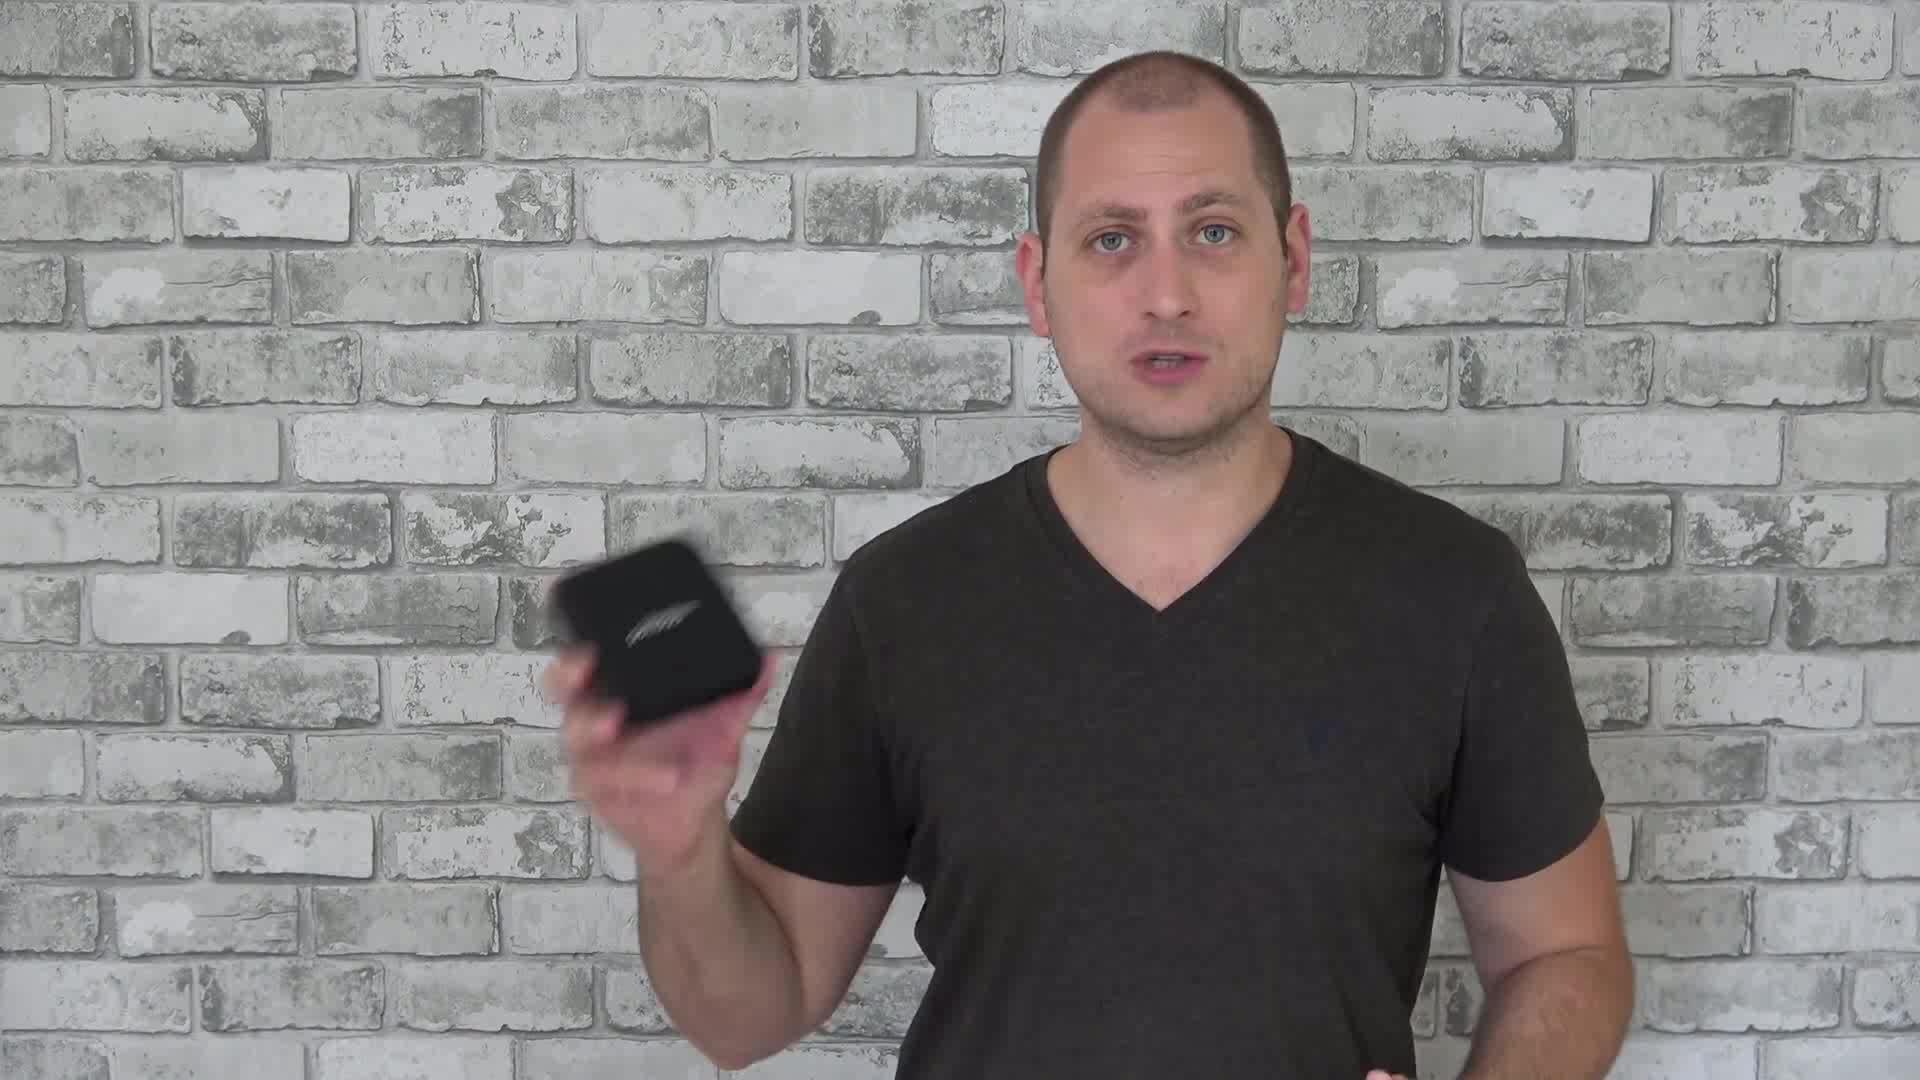 Giá tốt Pendoo X10 Pro S912 3 Gam 32 Gam tv box h 265 set top box với giá tốt Android 7.1 OS Set Top Box